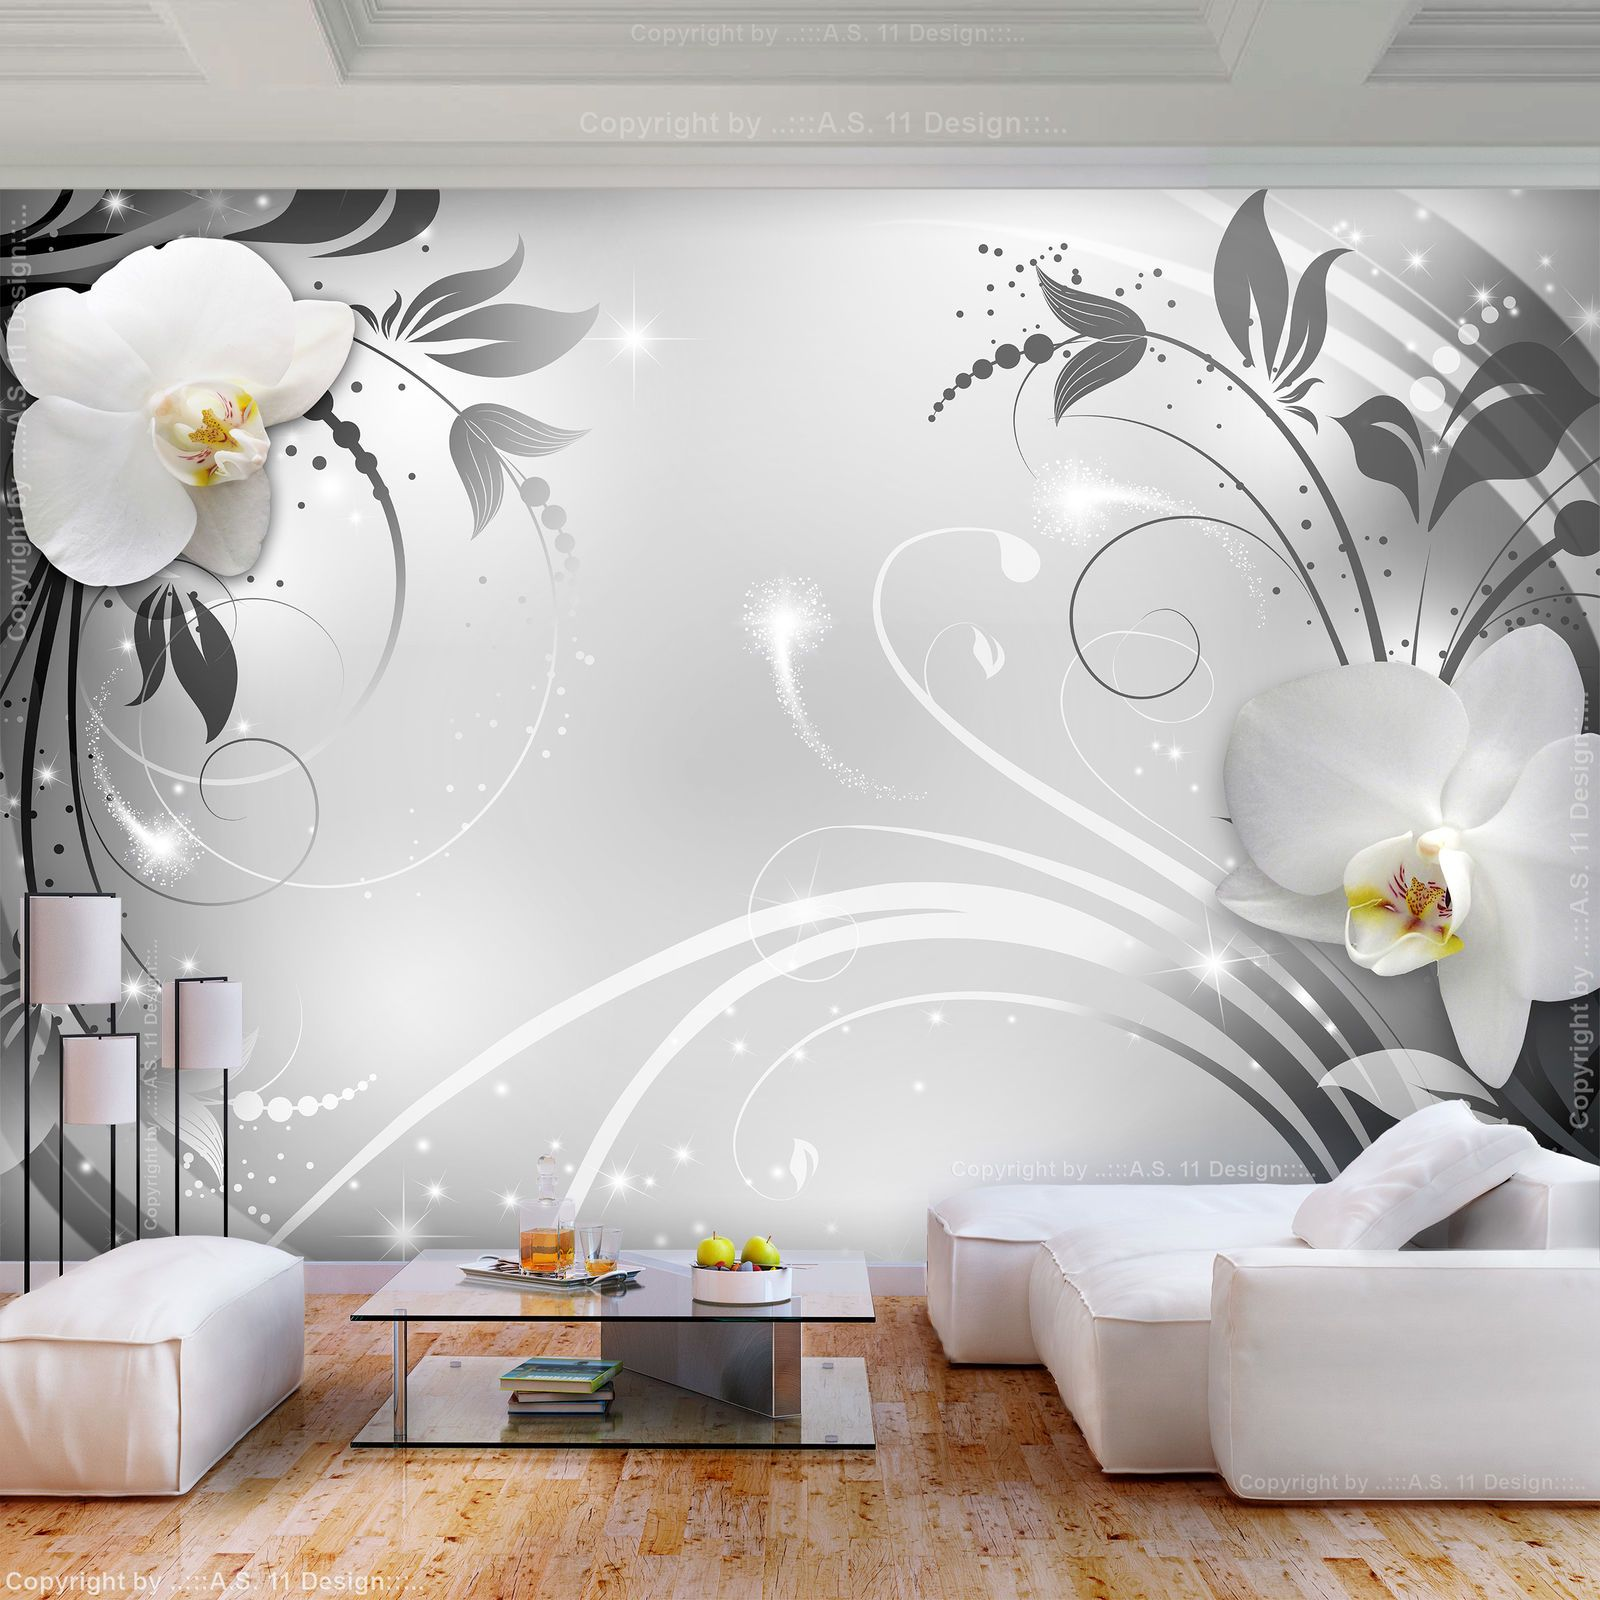 Vlies Fototapete 3d Effekt Blumen Tapete Schlafzimmer Wandbilder Xxl 3 Farbe Eur 8 99 Fertig Wandbilder L Tapete Schlafzimmer Fototapete Tapeten Wandbilder